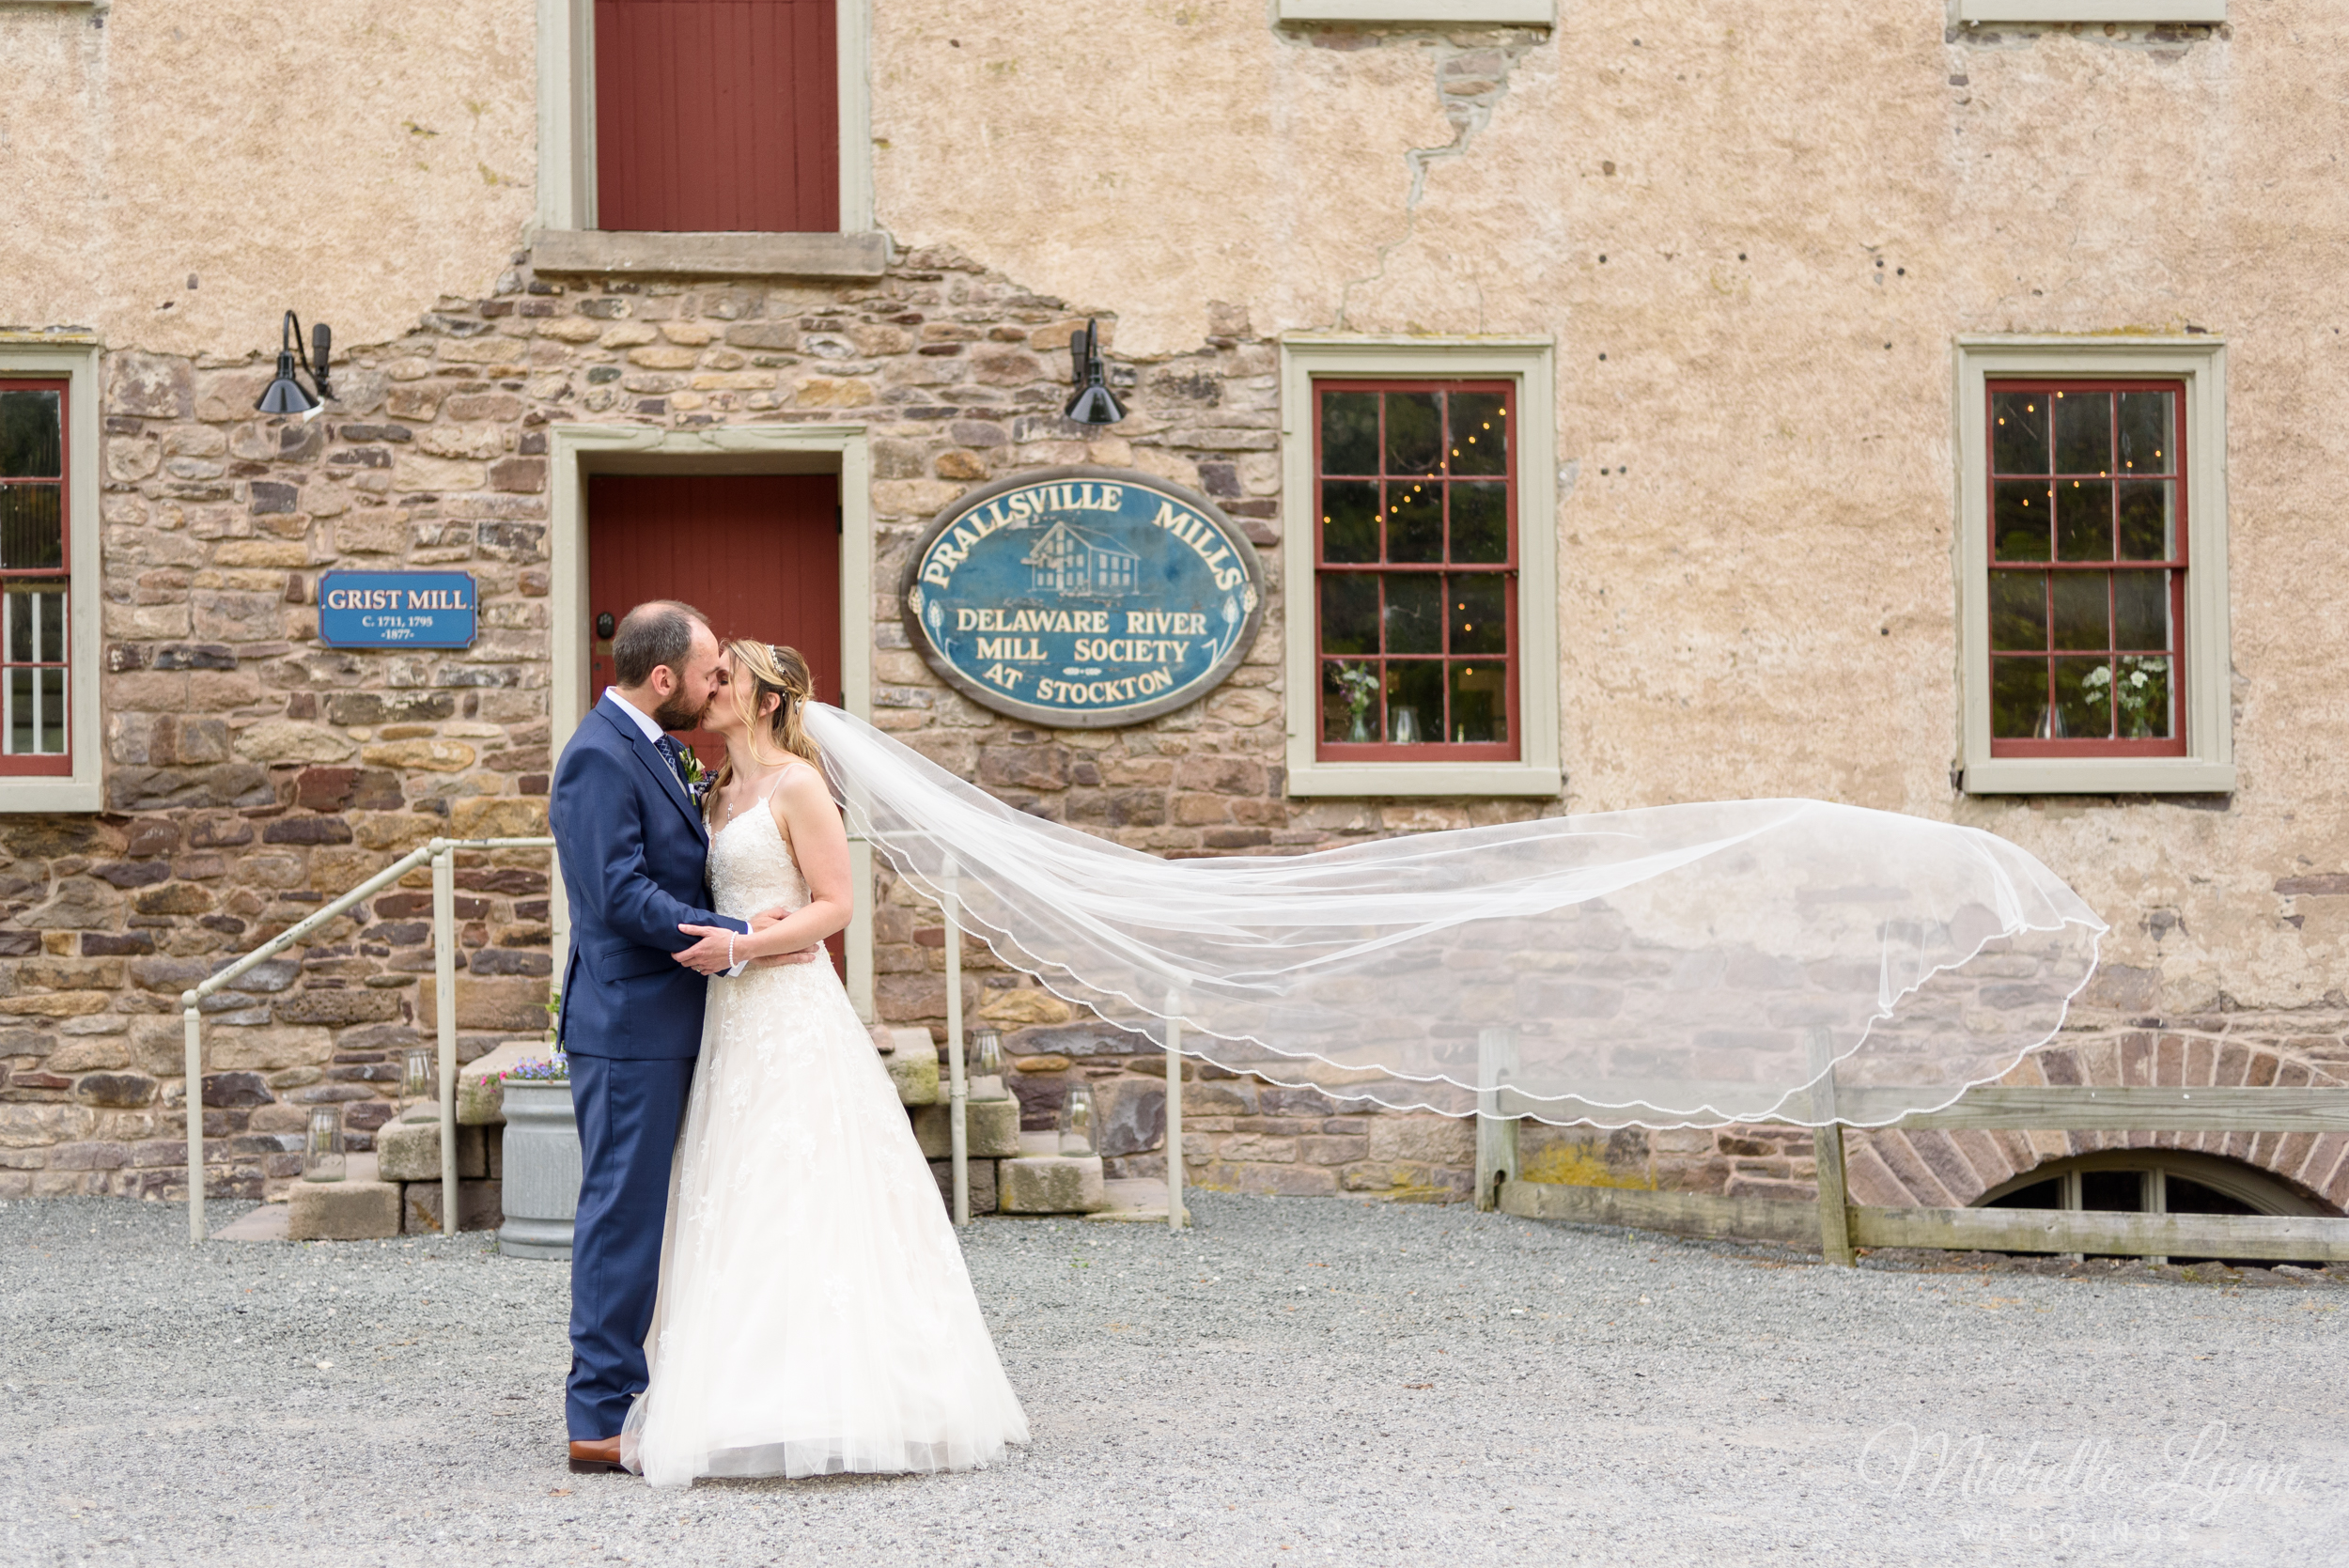 mlw-prallsville-mills-nj-wedding-photographer-64.jpg